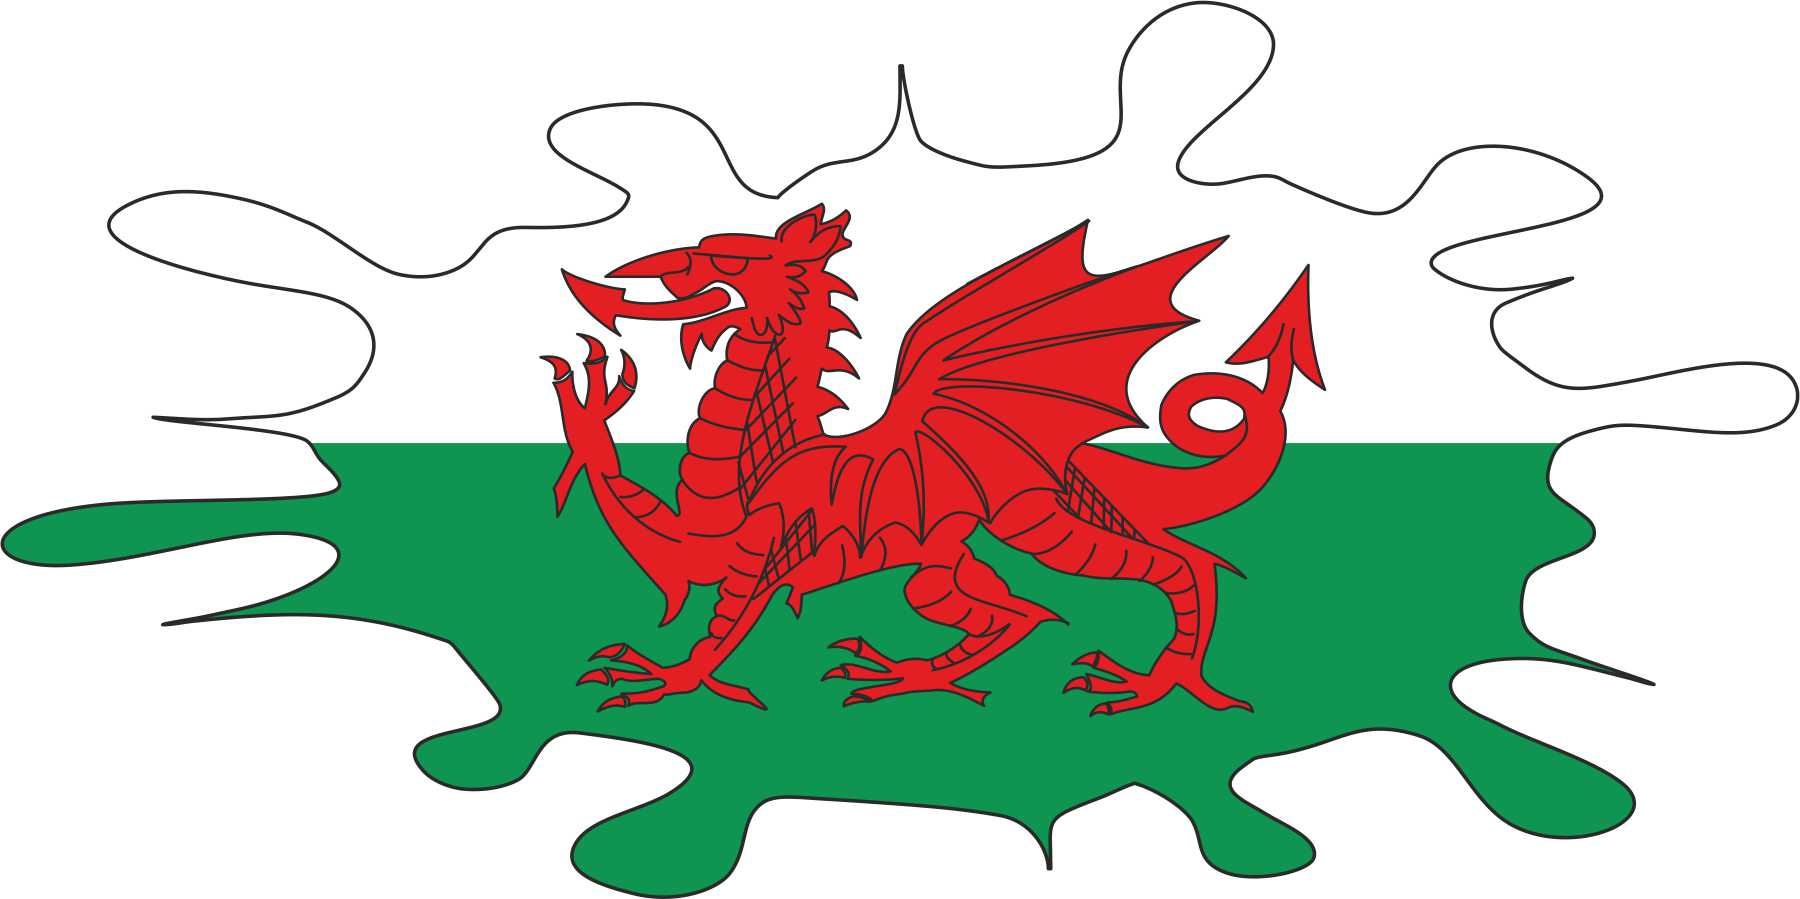 clipart welsh flag - photo #10